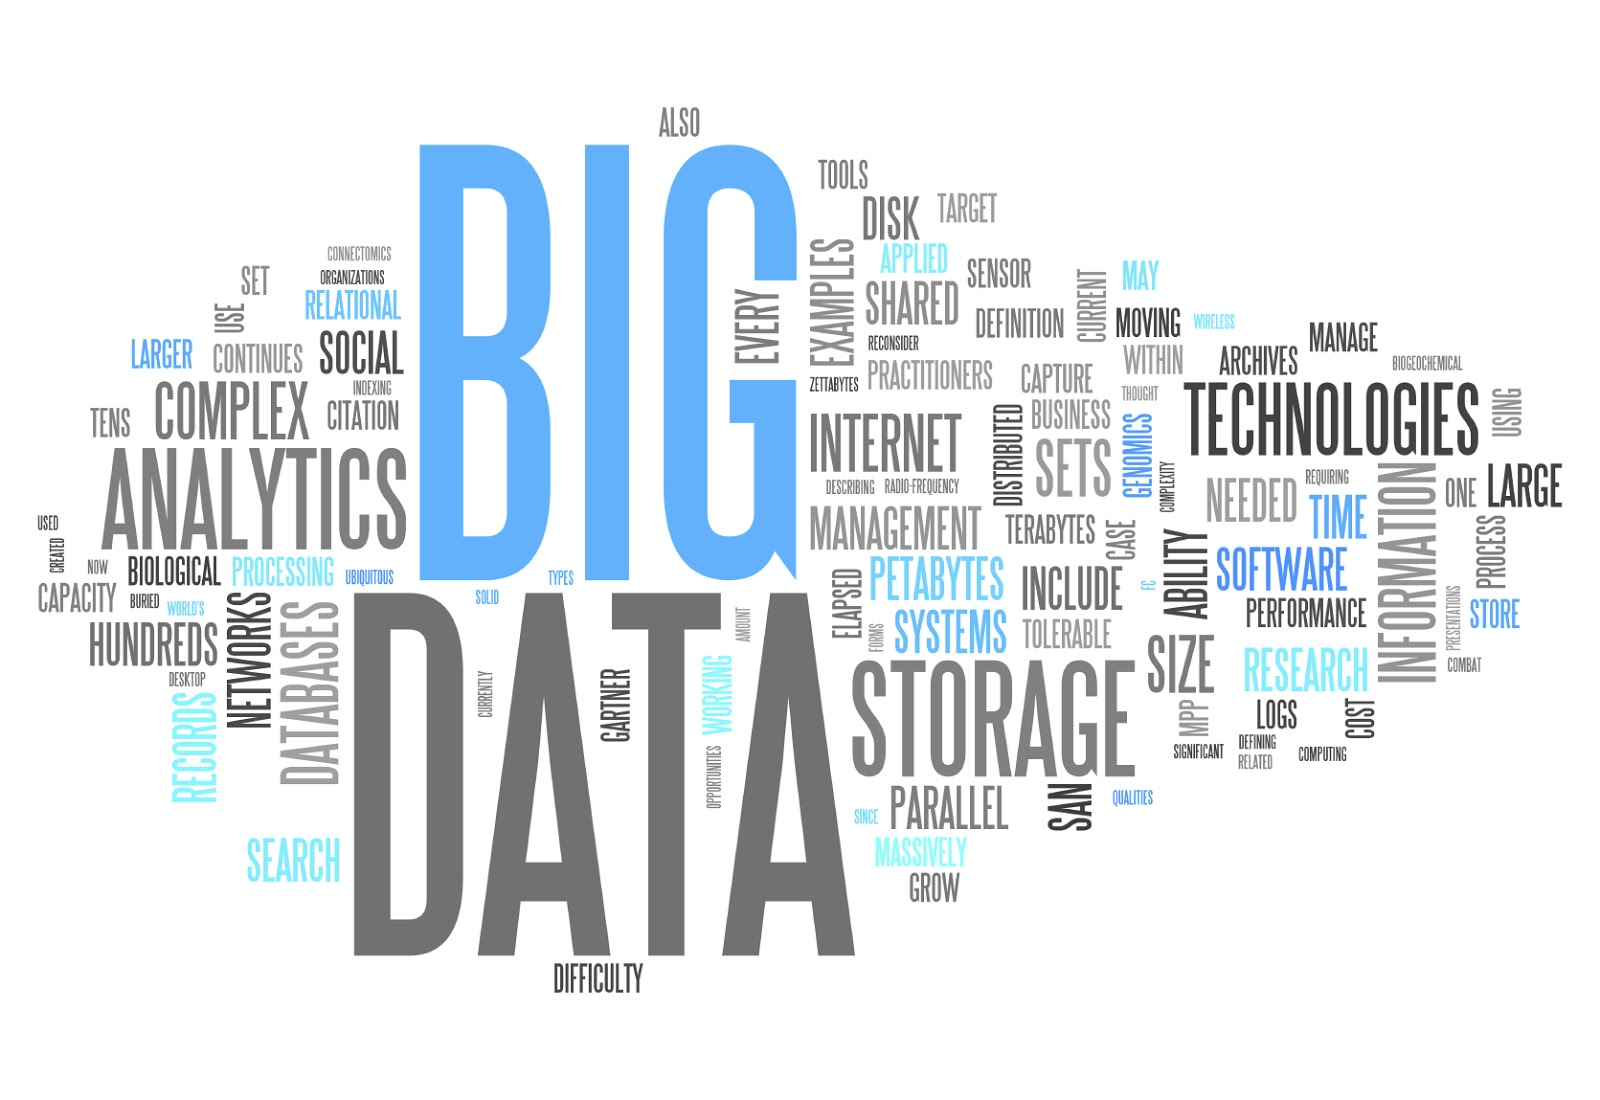 EIOPA SEEKS EVIDENCE ON THE USE OF BIG DATA | ASFALISINET